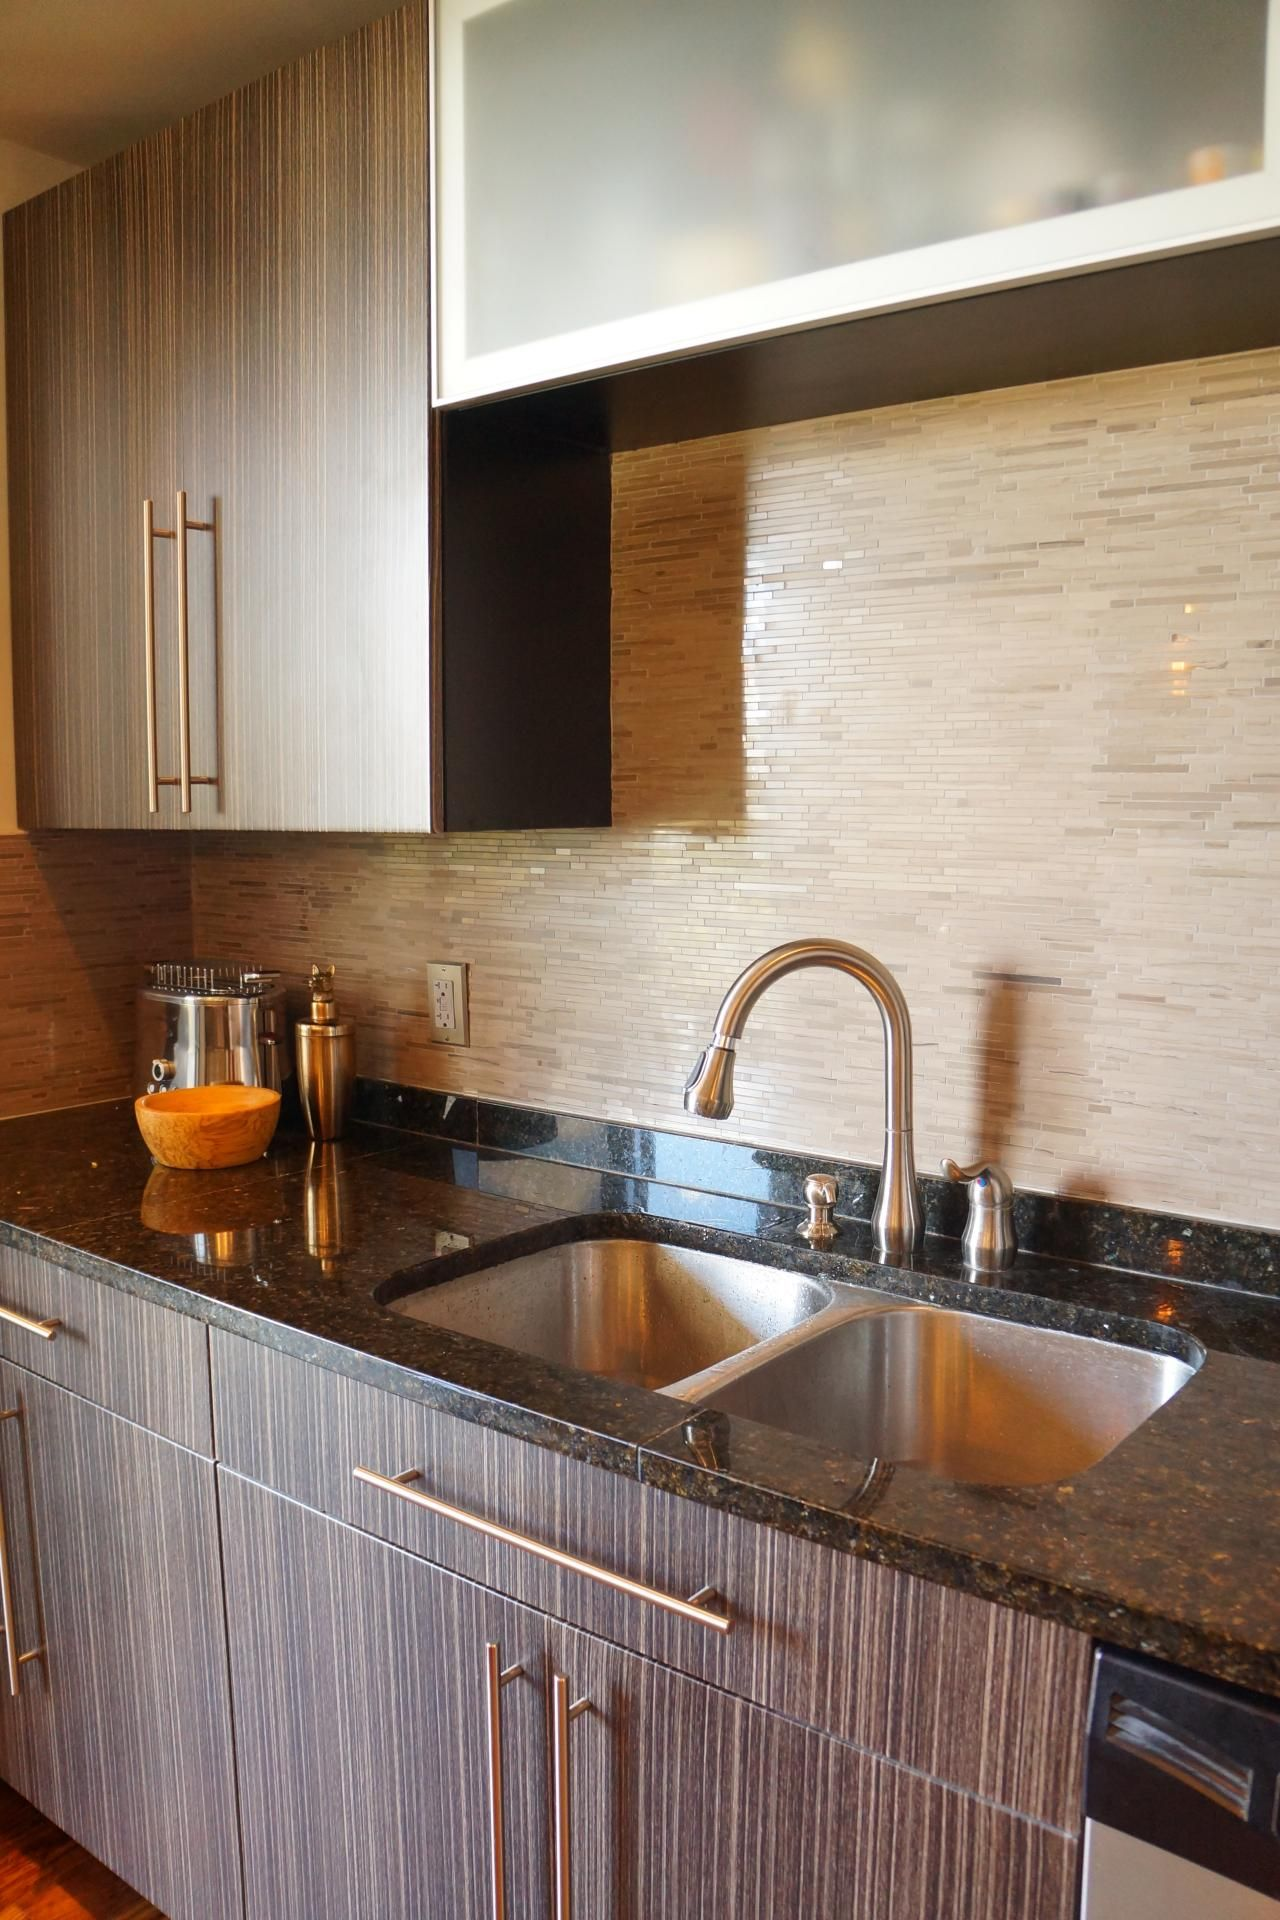 ultra thin mosaic tiles run horizontally along this kitchen s backsplash creating subtle on kitchen interior tiles id=44389